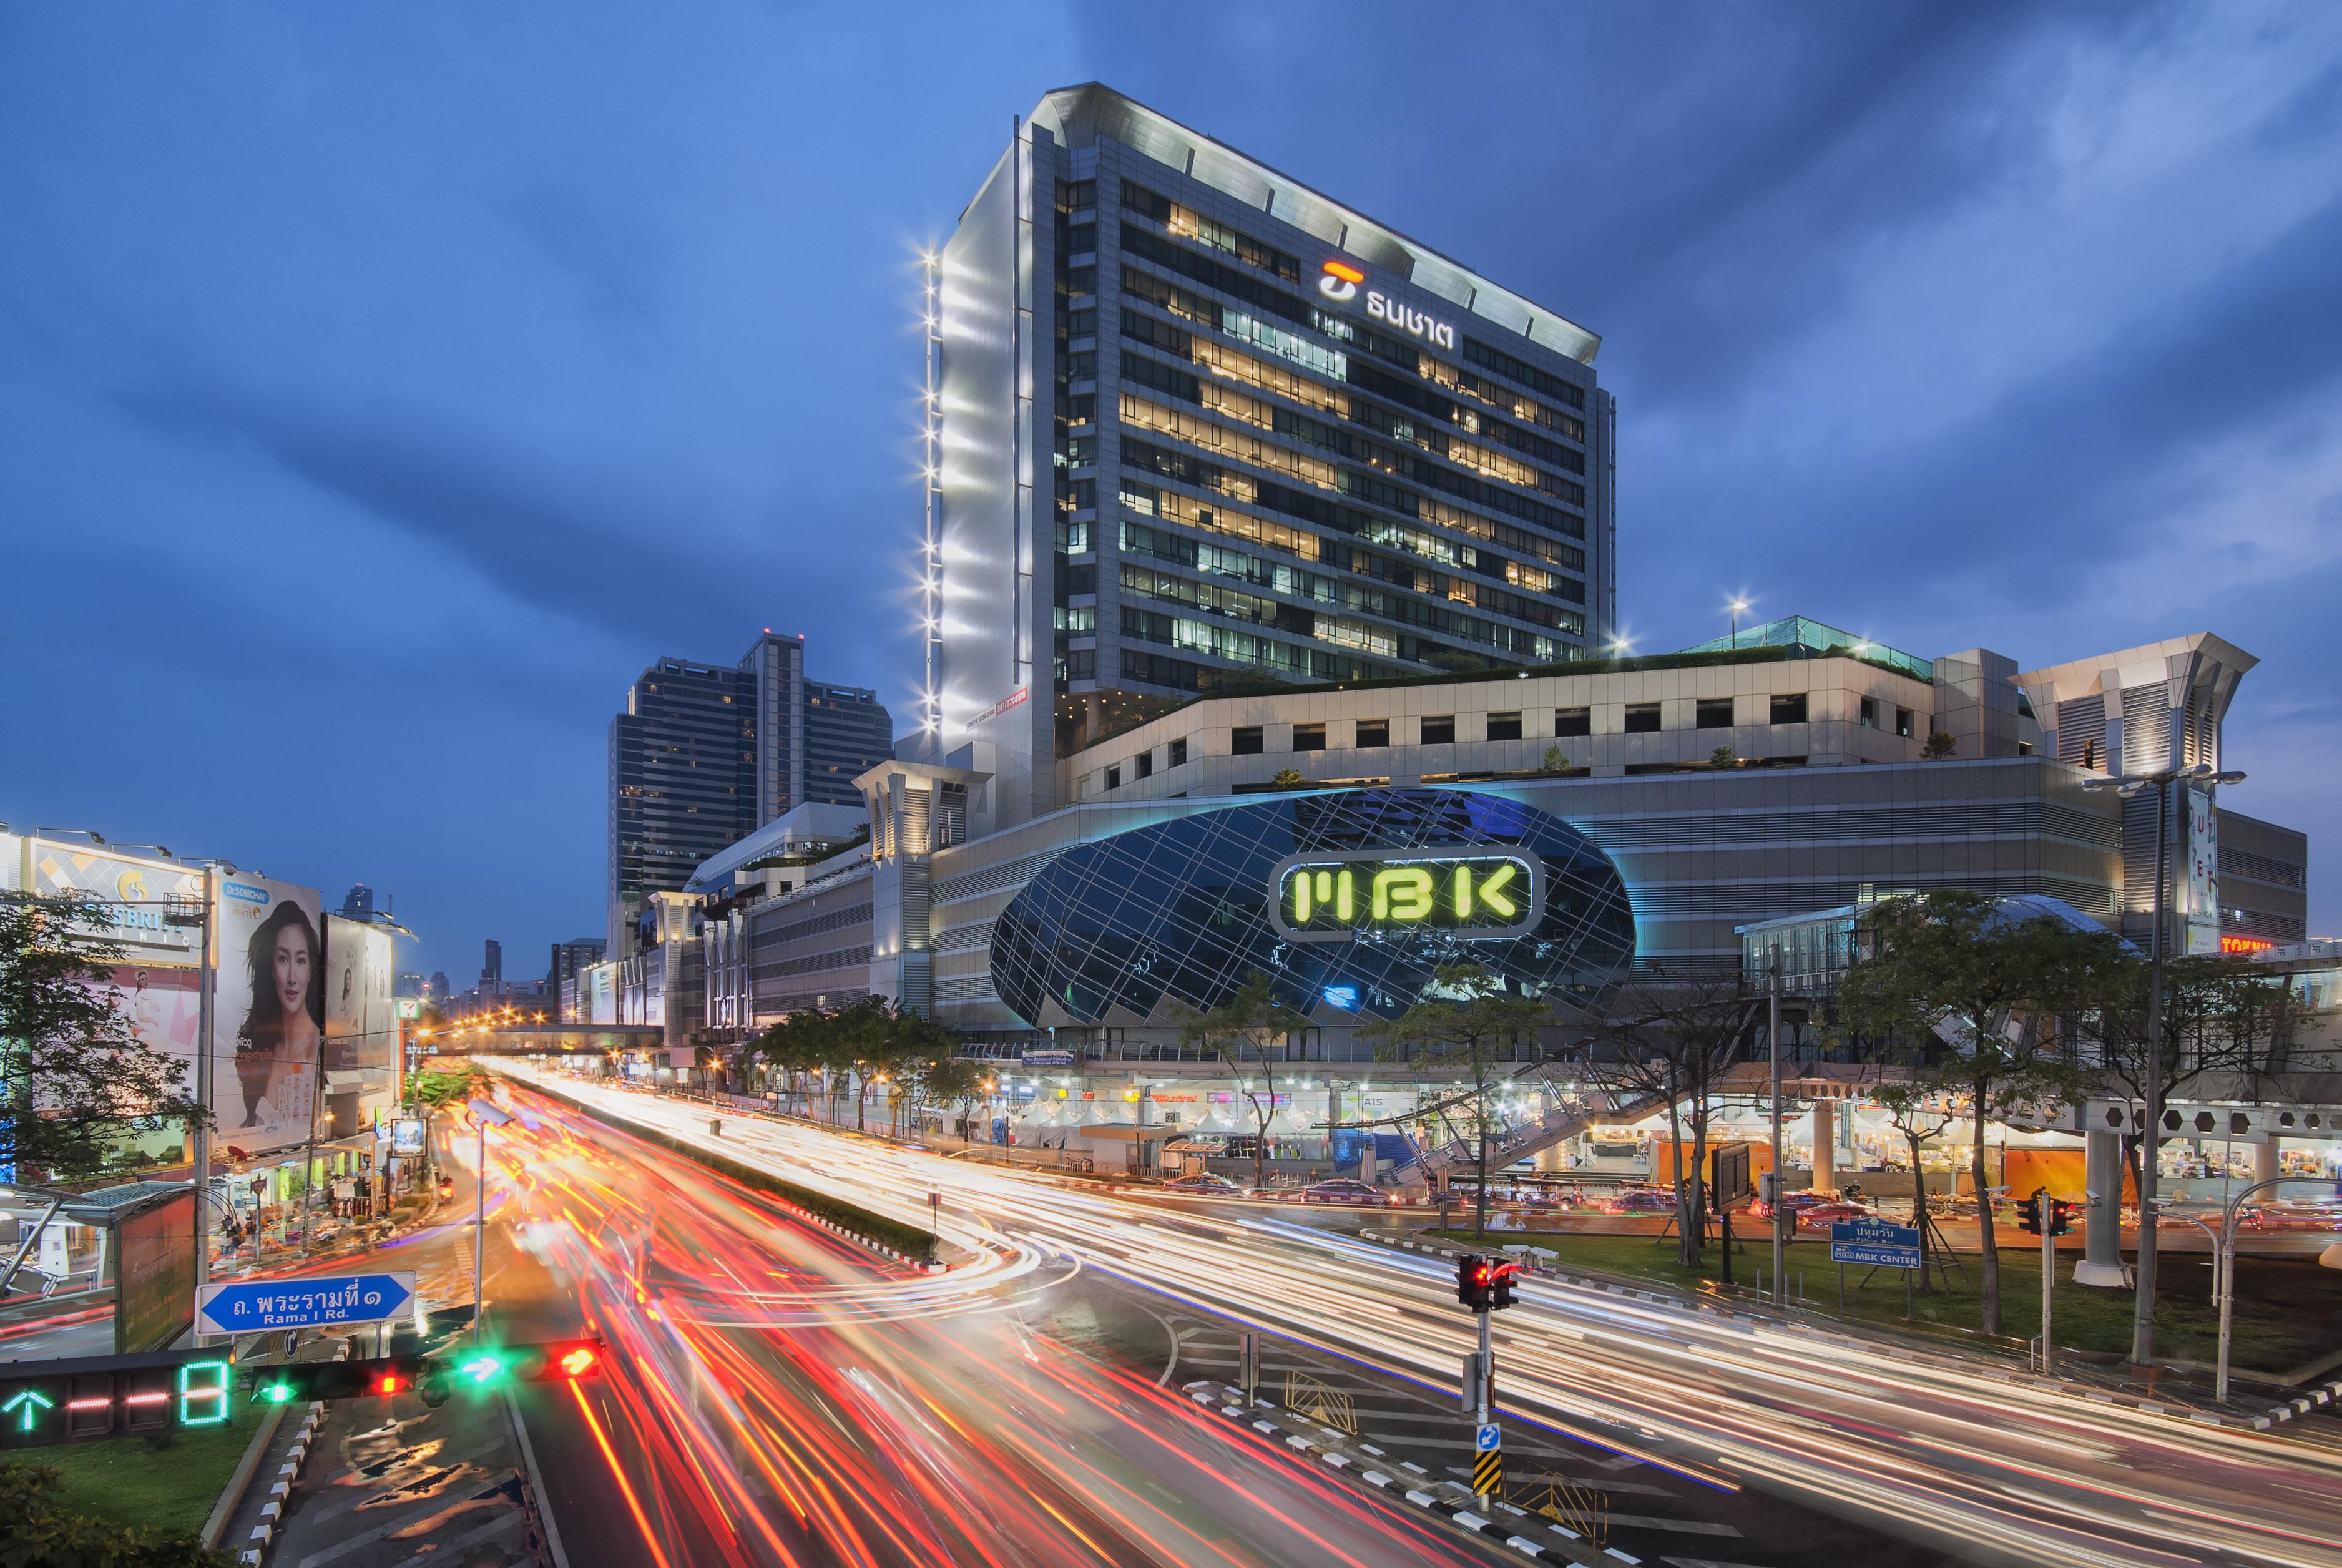 De shopping por Bangkok - Tailandia Gran Viaje Tailandia al completo